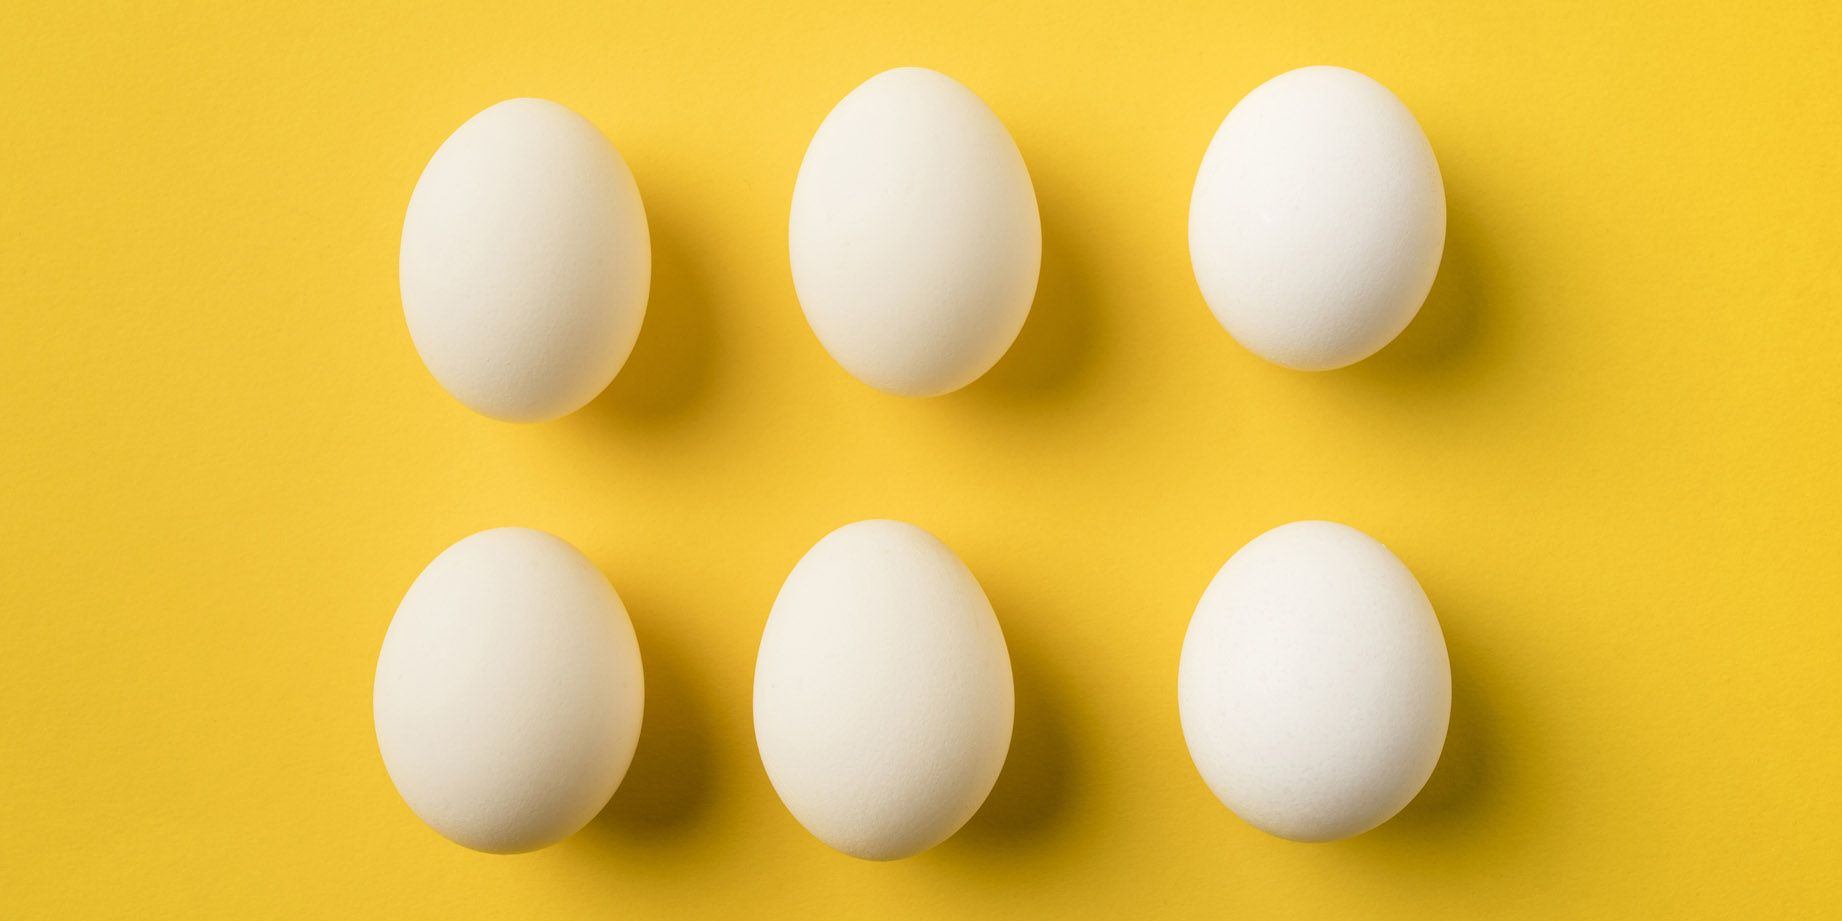 six Chicken eggs